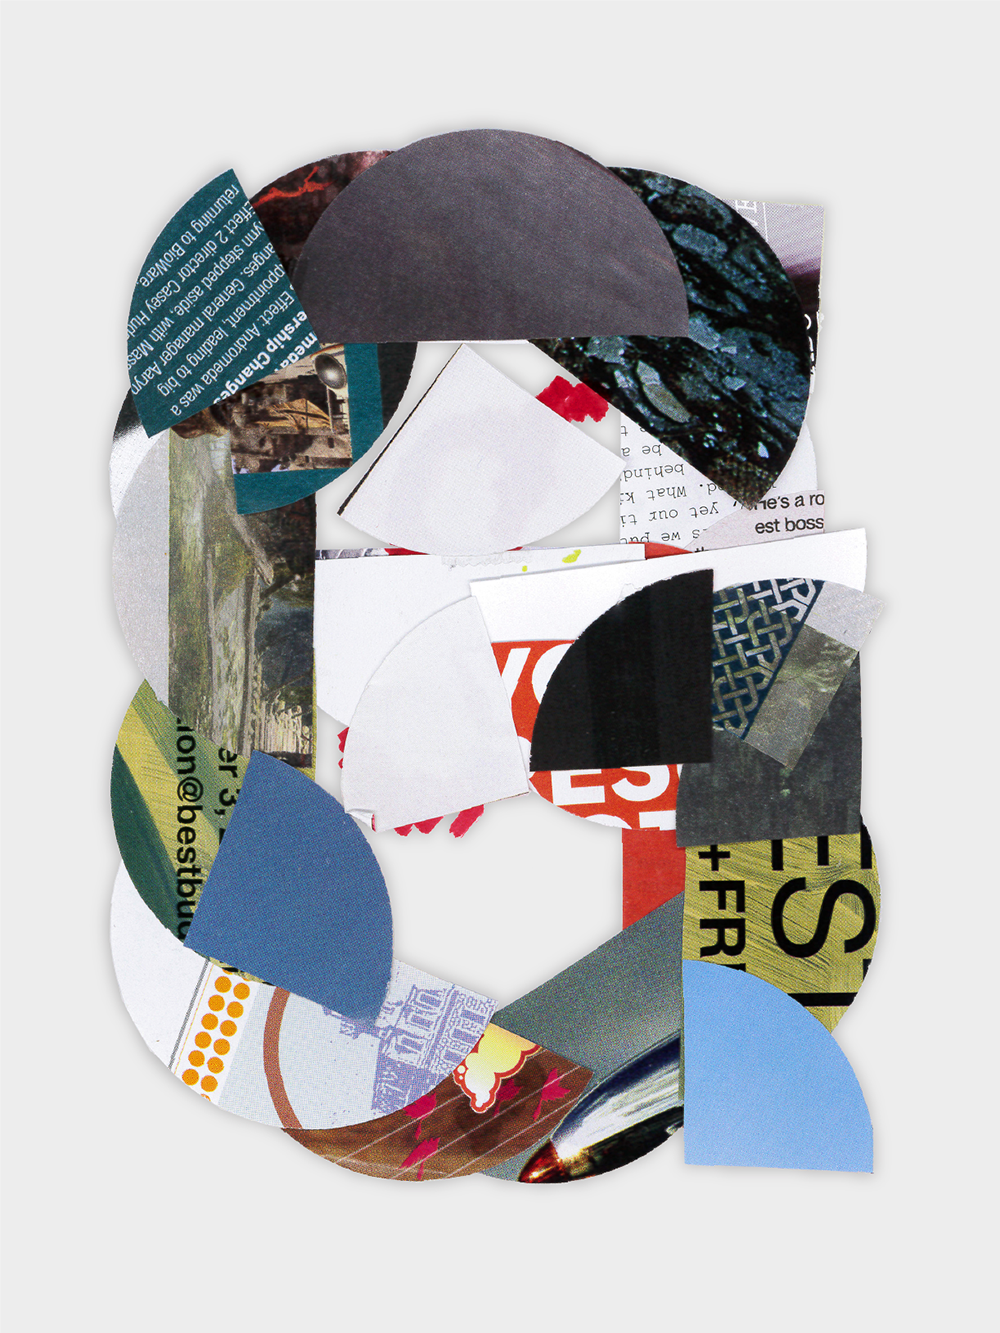 Gestalt_Emergence_FinalPoster-03.png